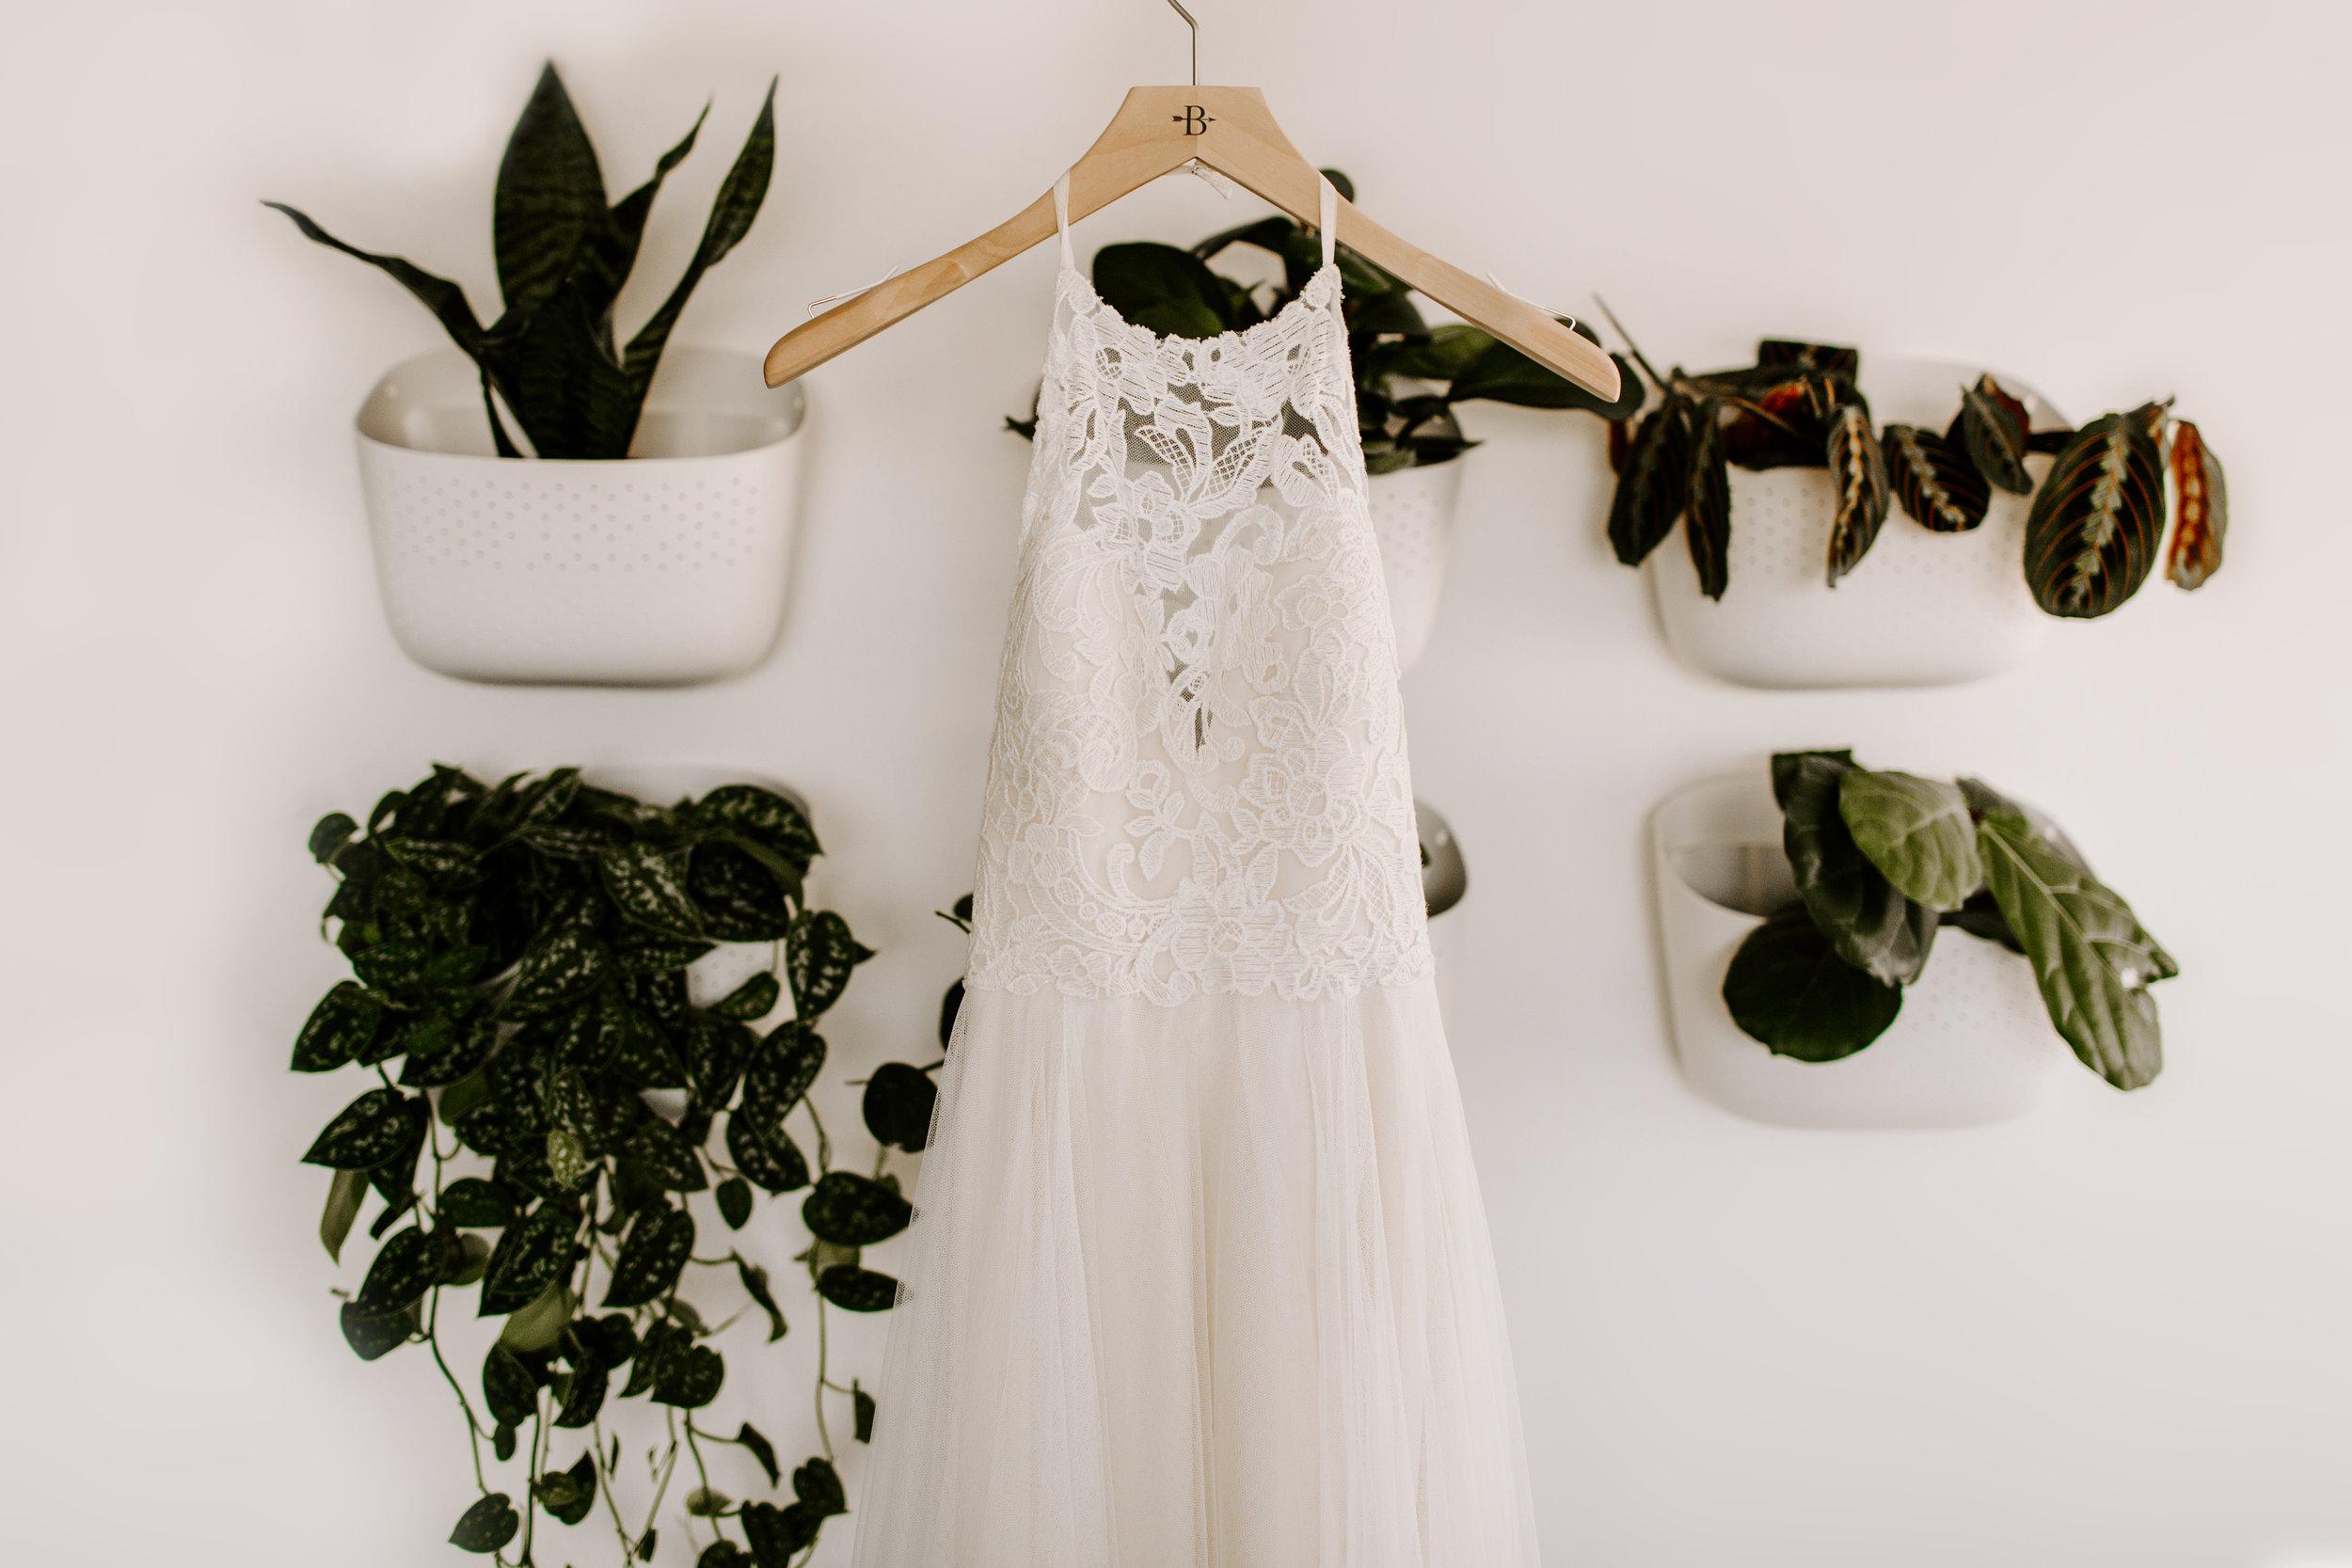 sarah+neuman_wedding_madisonrylee_0004 copy.jpg